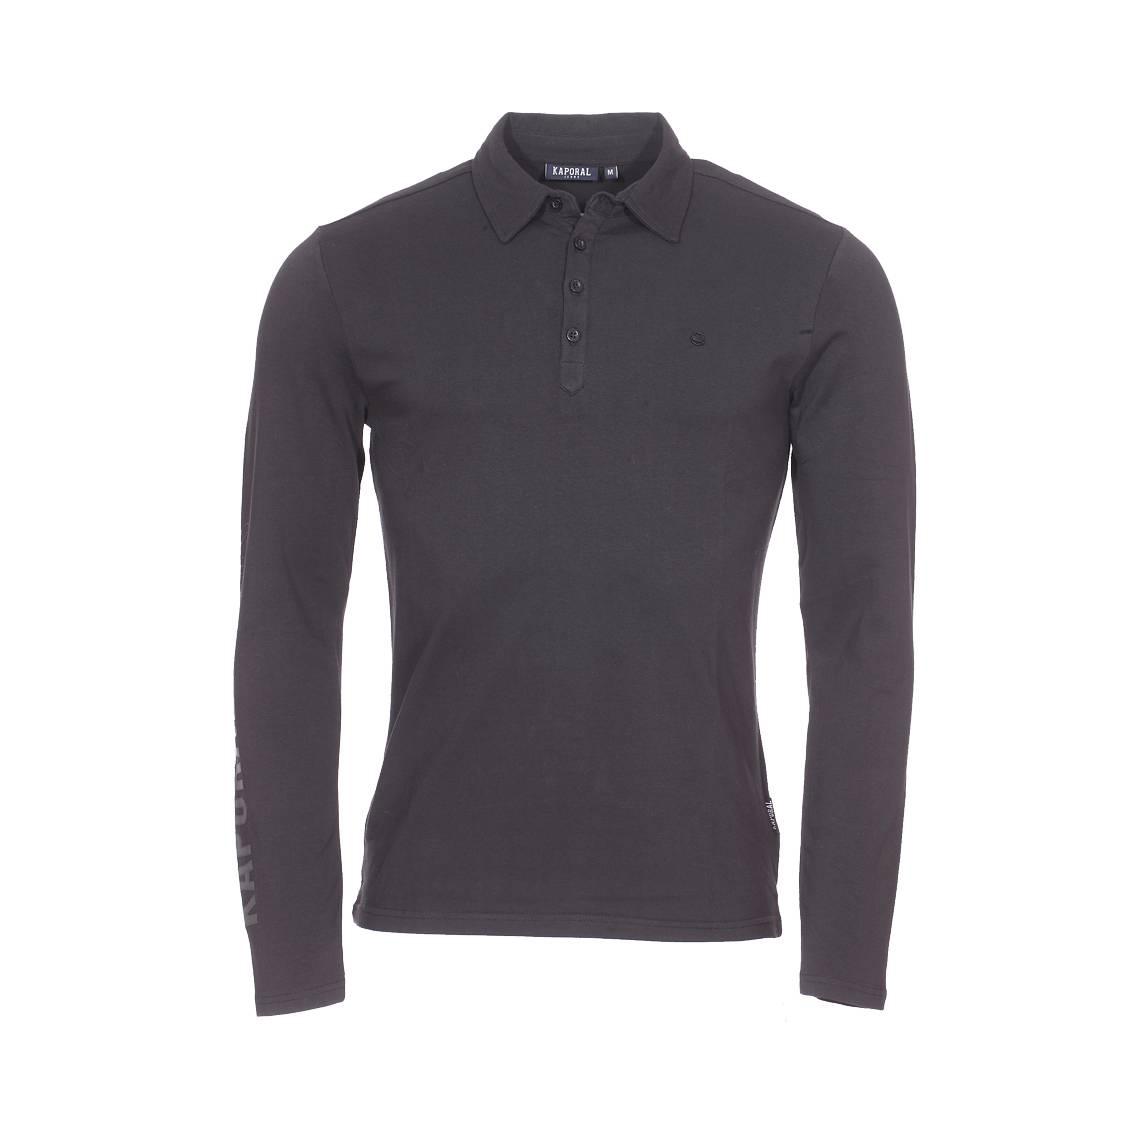 Polo manches longues  lizon en coton stretch noir